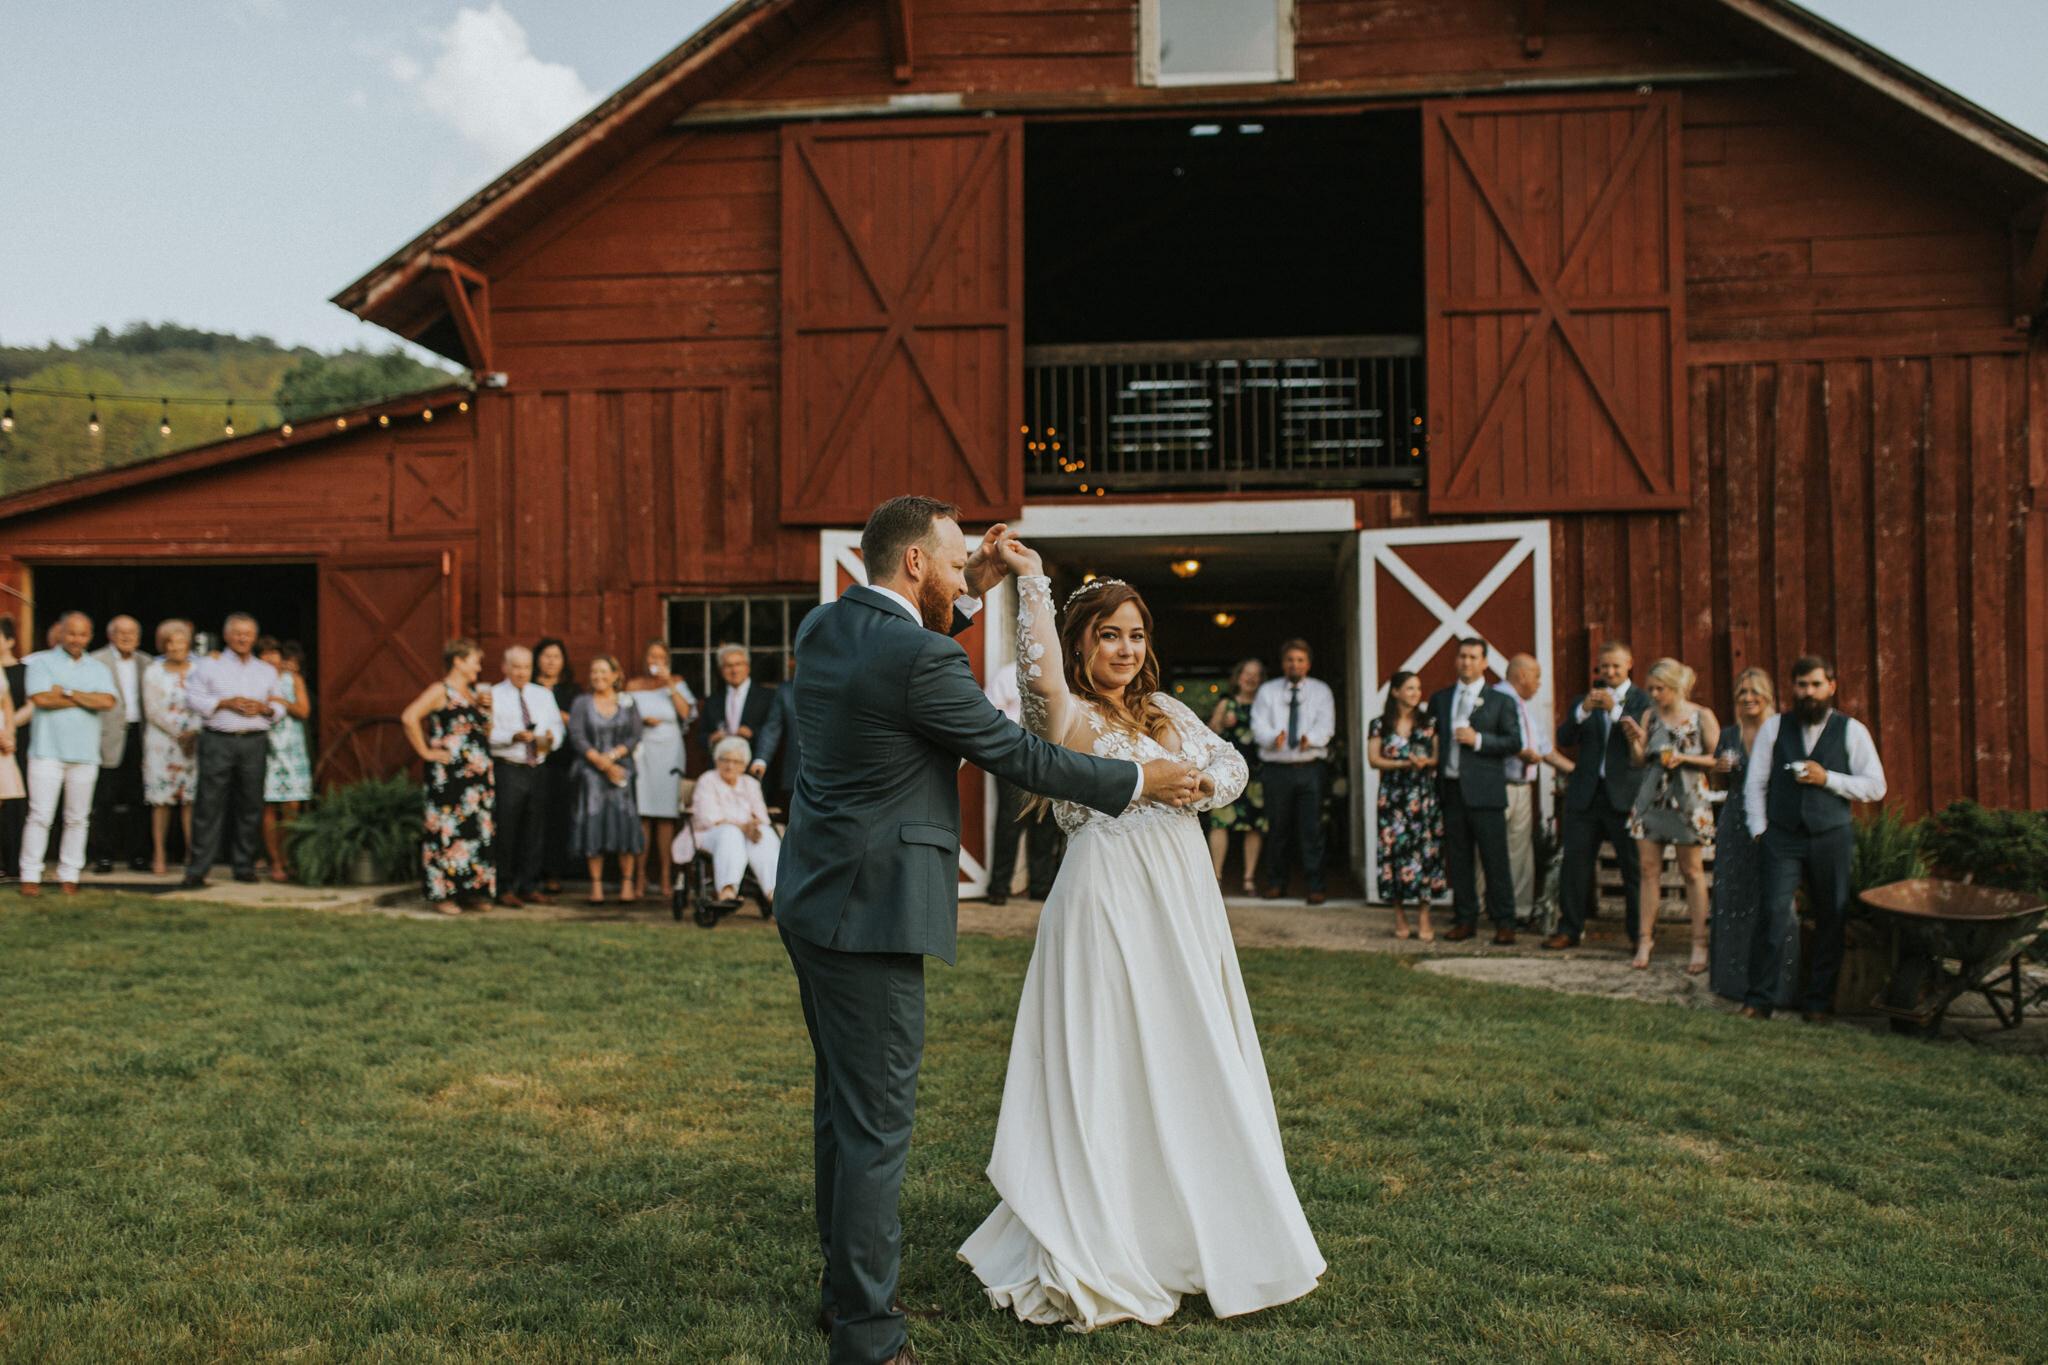 KateMatt-North-Georgia-Wedding-Photographer-Mountain-Laurel-Farm-123.jpg